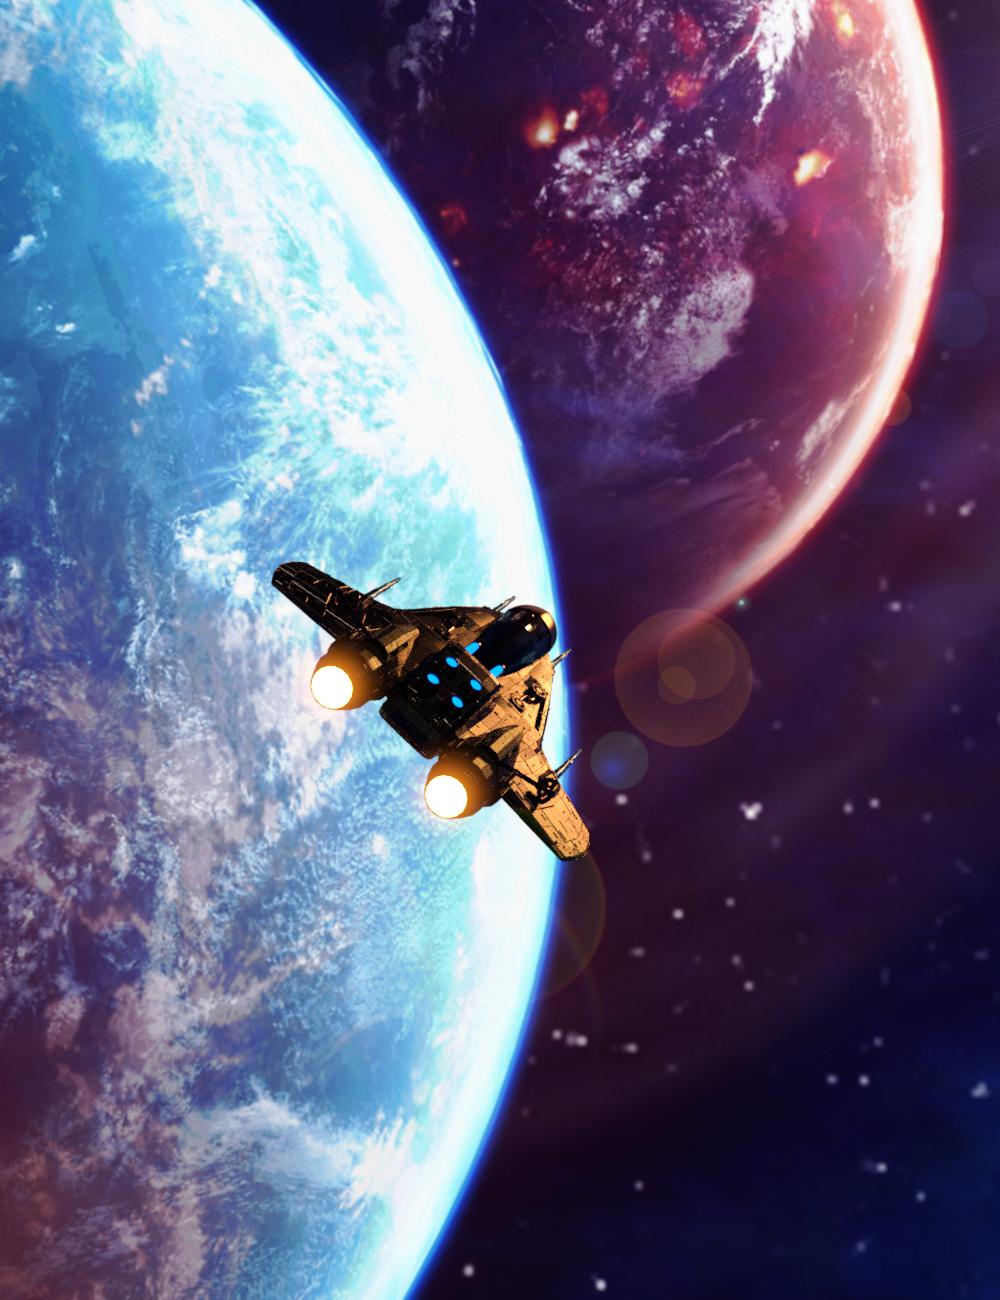 Sci-Fi HDRI by: AcharyaPolina, 3D Models by Daz 3D